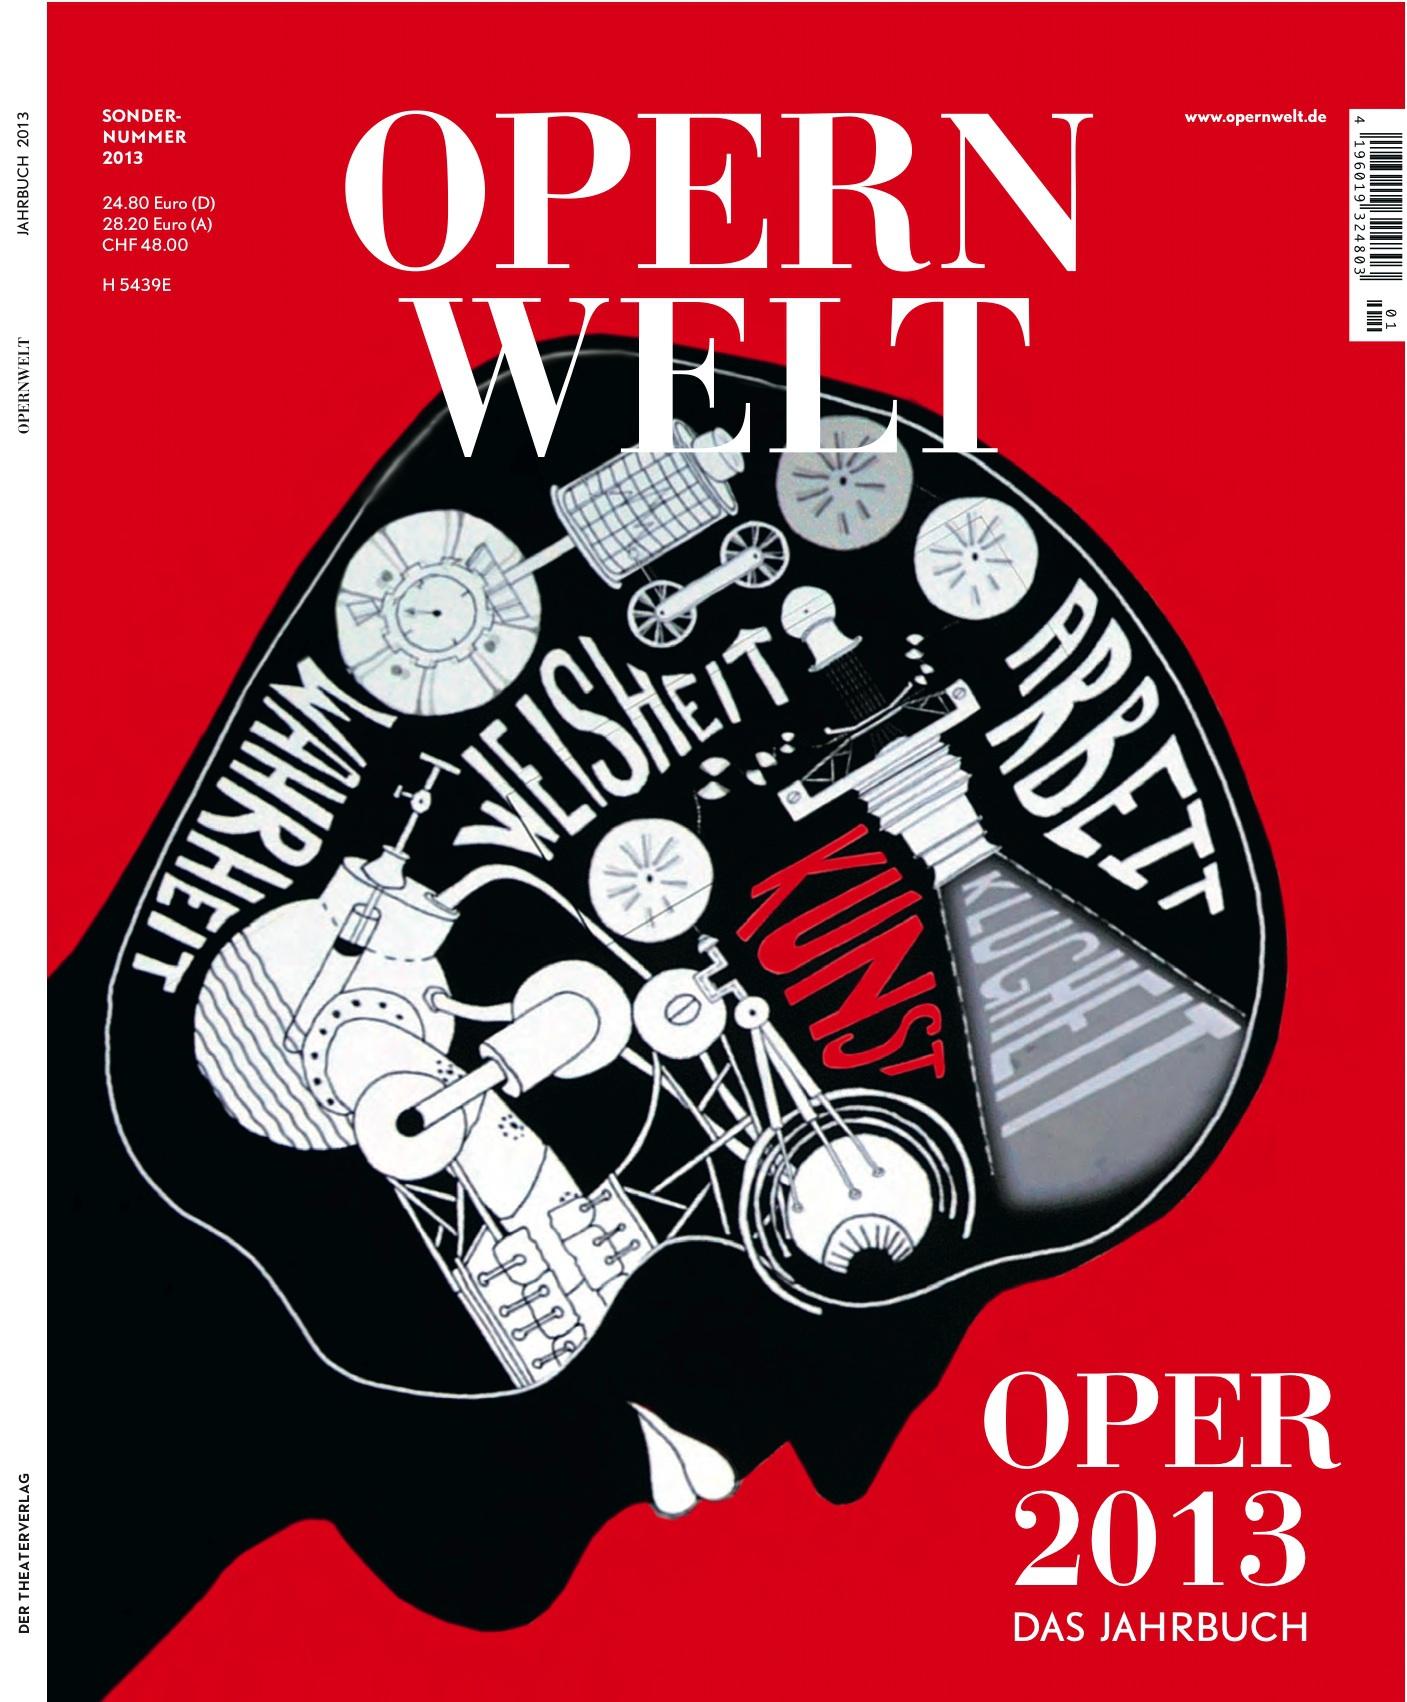 Opernwelt Jahrbuch (13/2013)